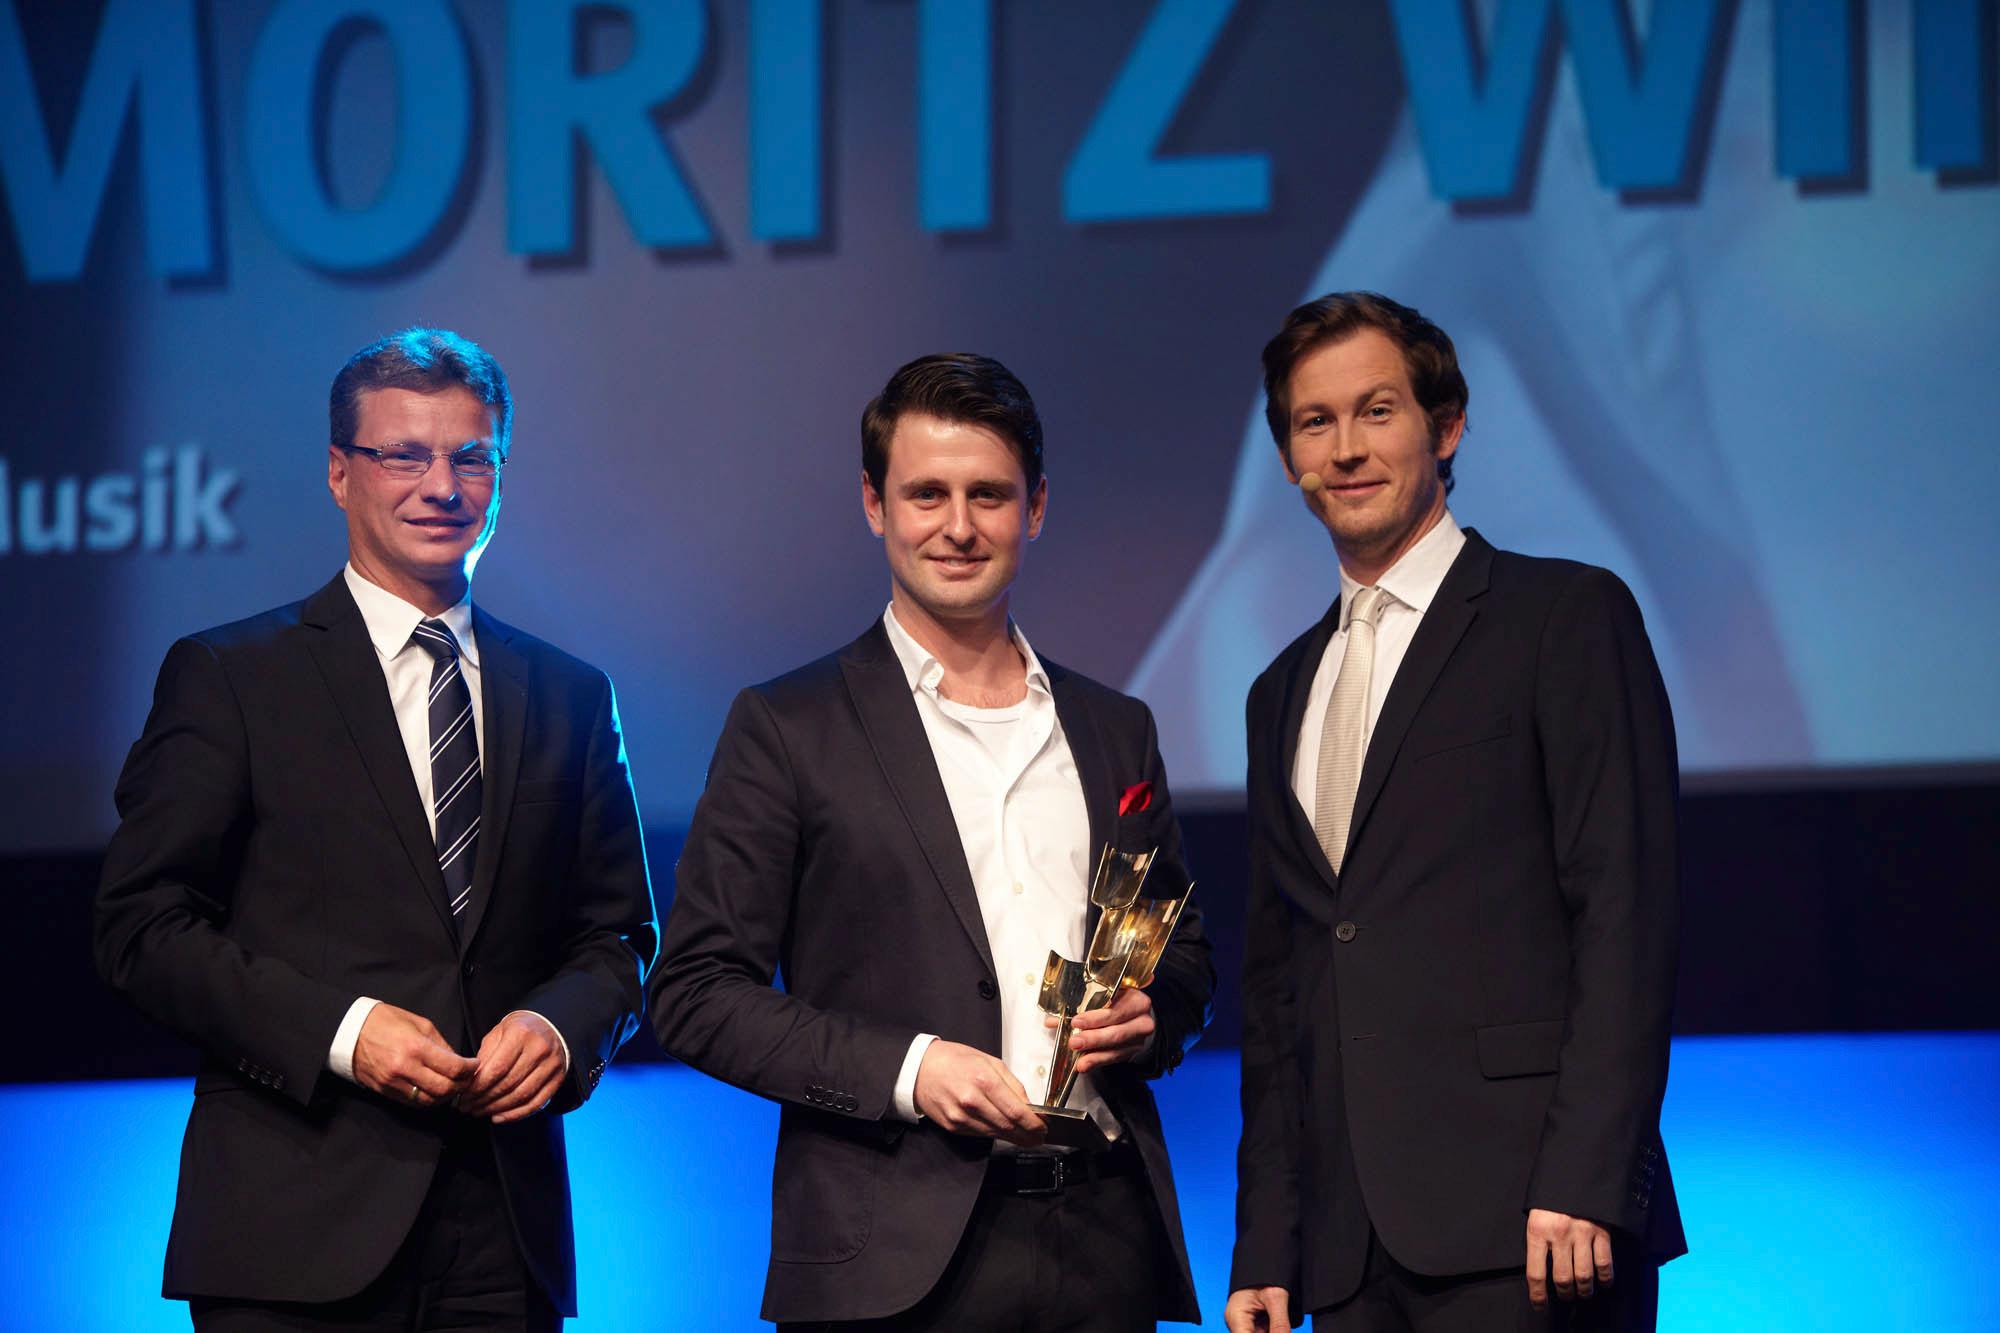 State Secretary Bernd Sibler presents the Bavarian Culture Prize to Moritz Winker